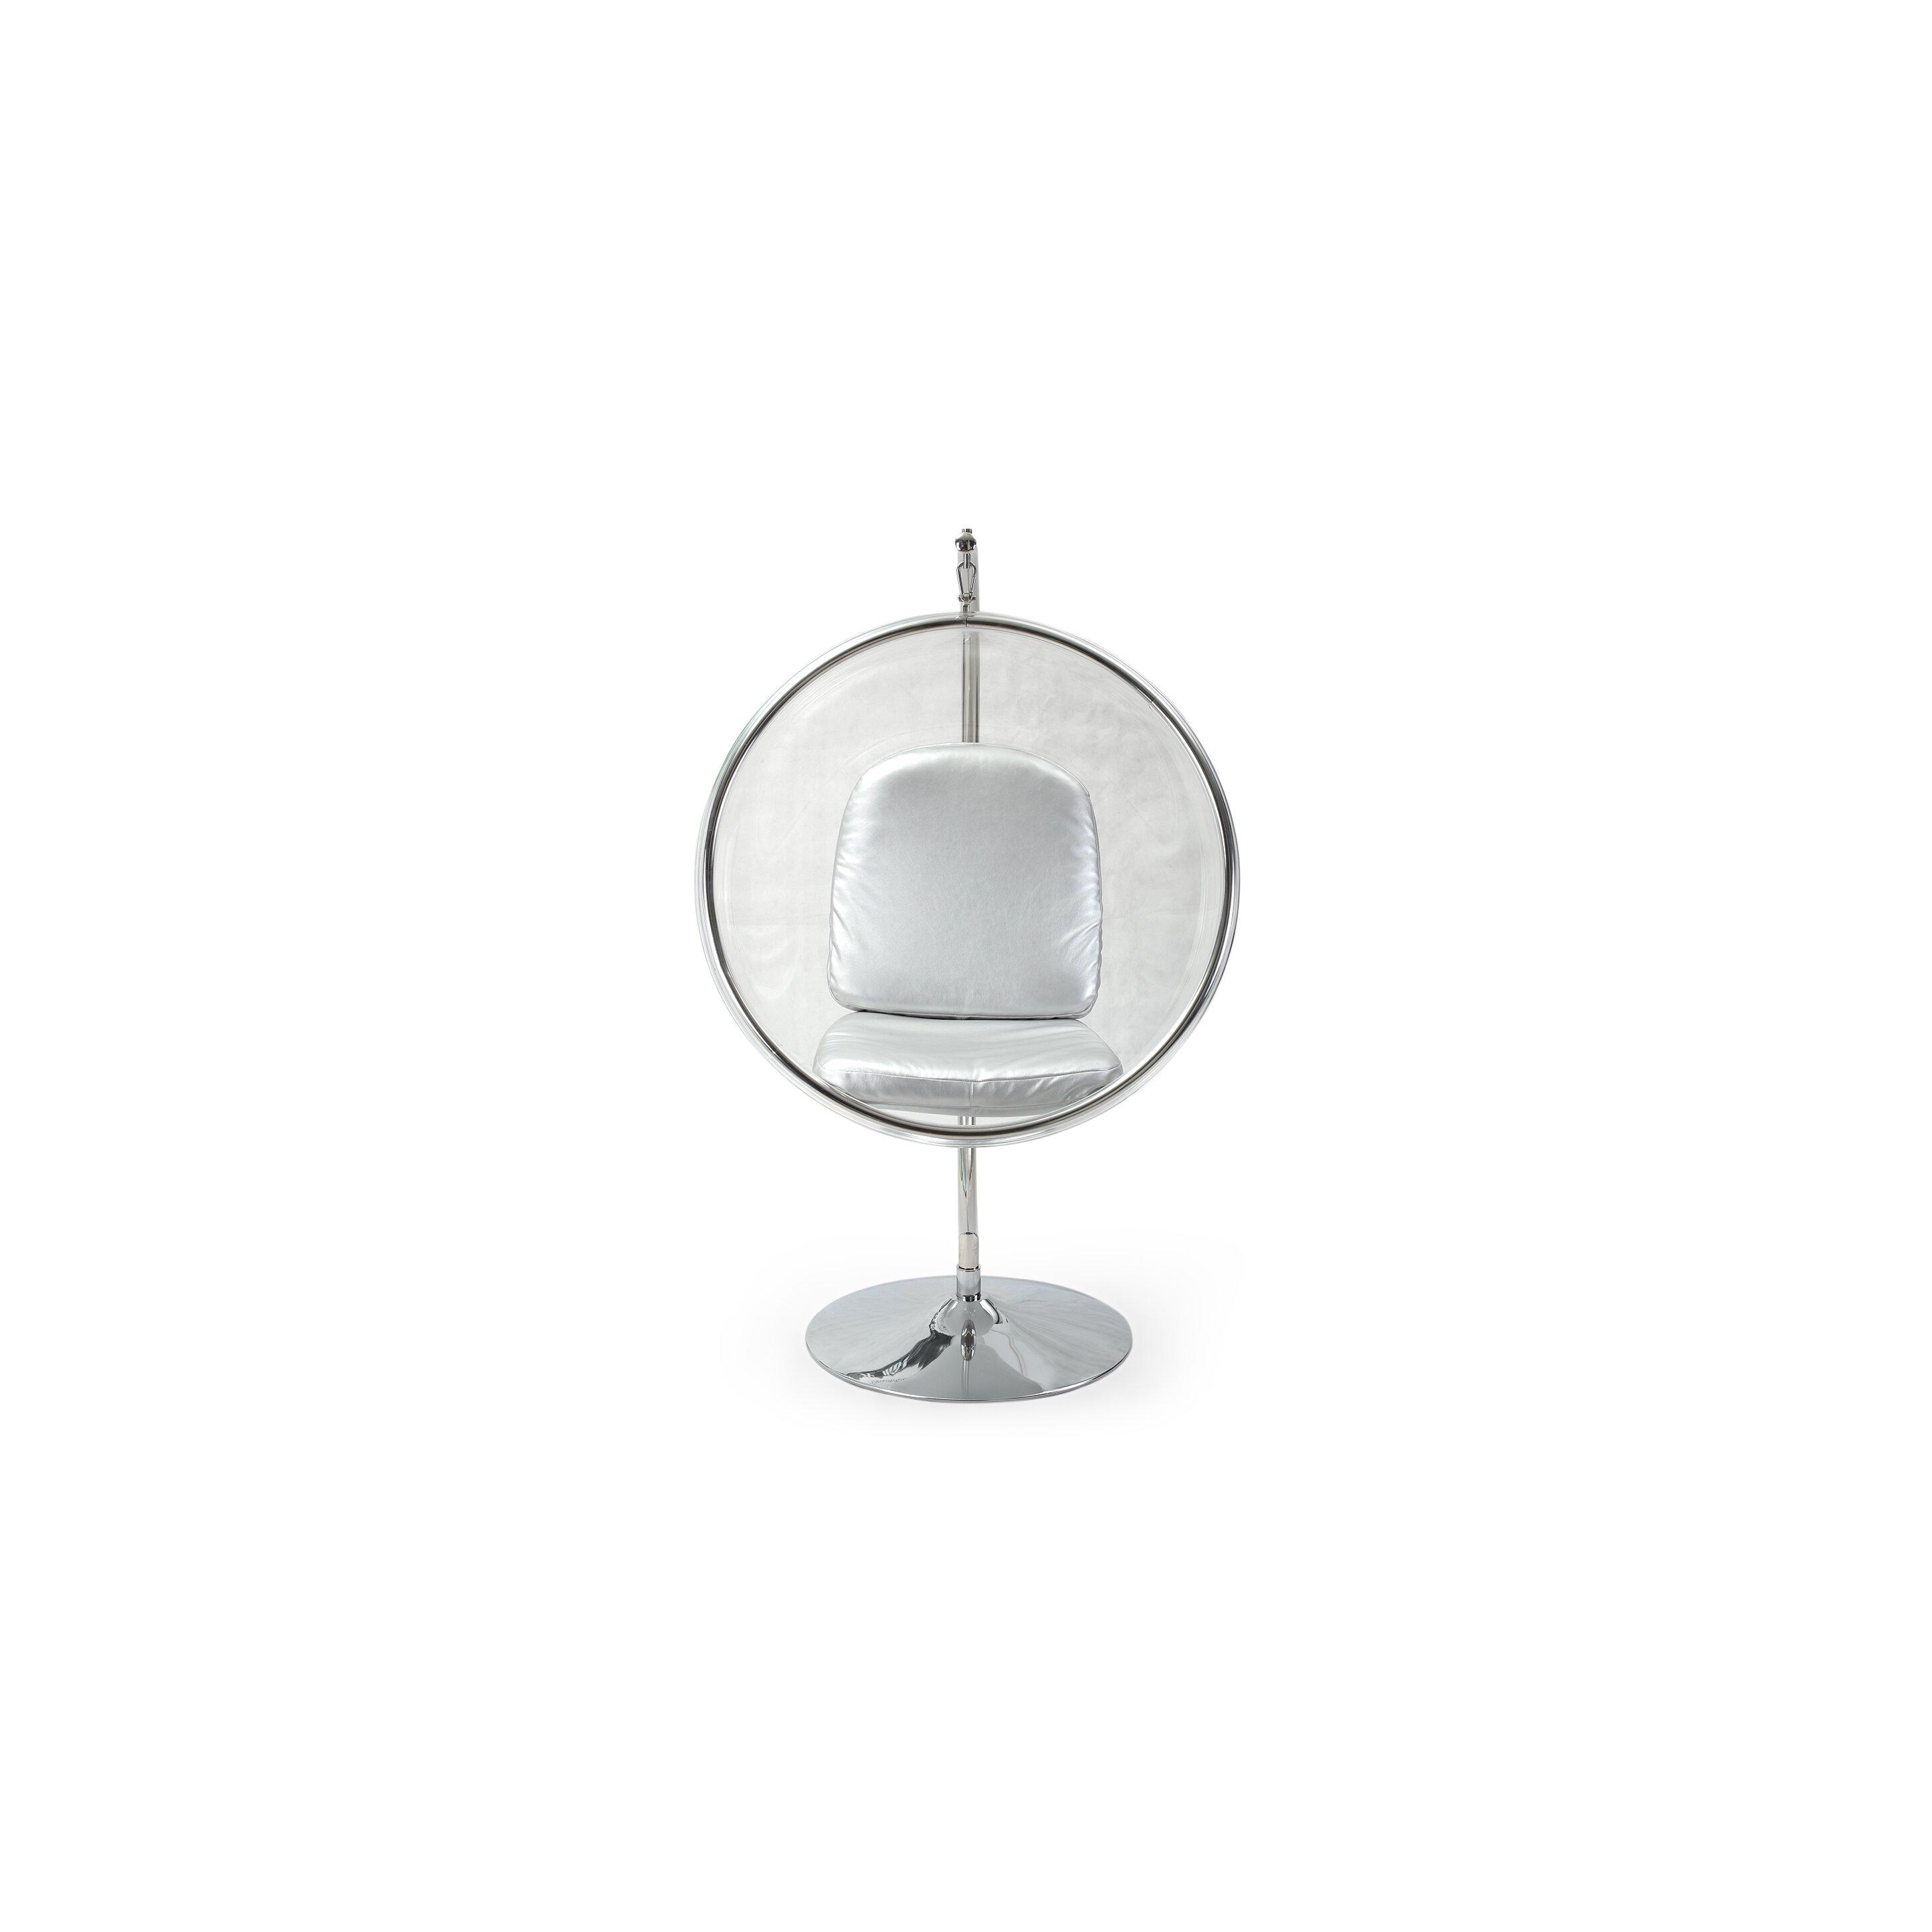 kardiel bubble chair wayfair. Black Bedroom Furniture Sets. Home Design Ideas